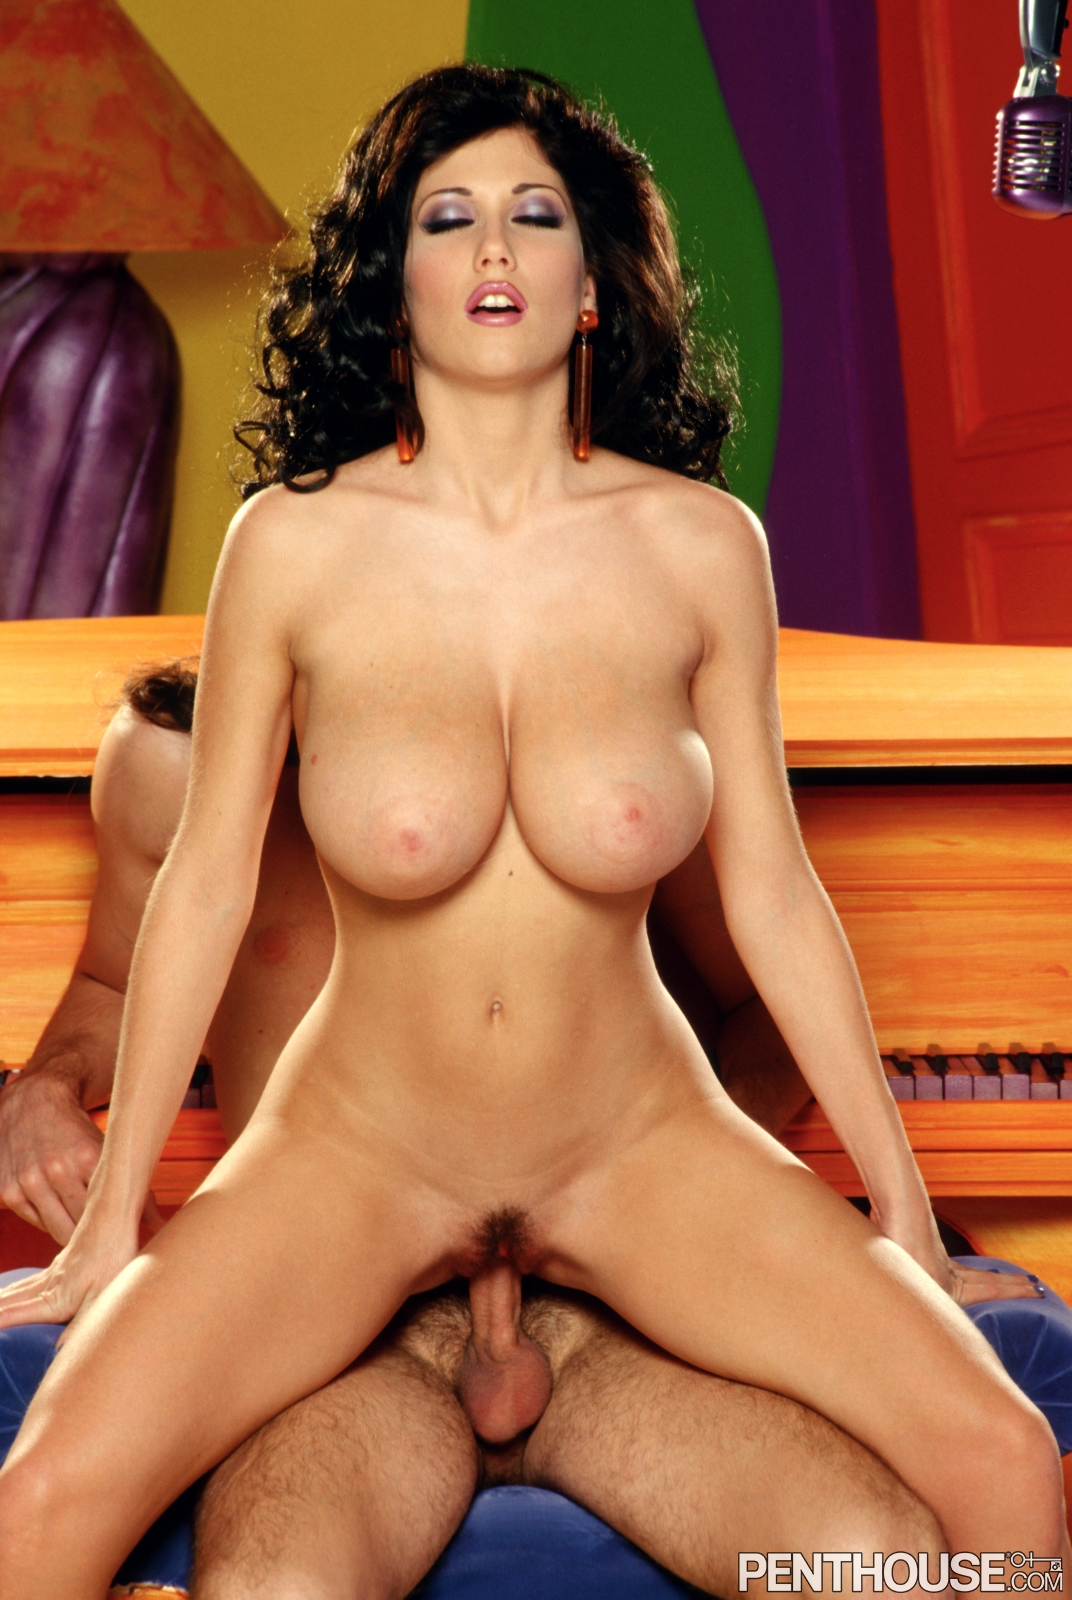 Porn stephanie dahl Stephanie Dahl